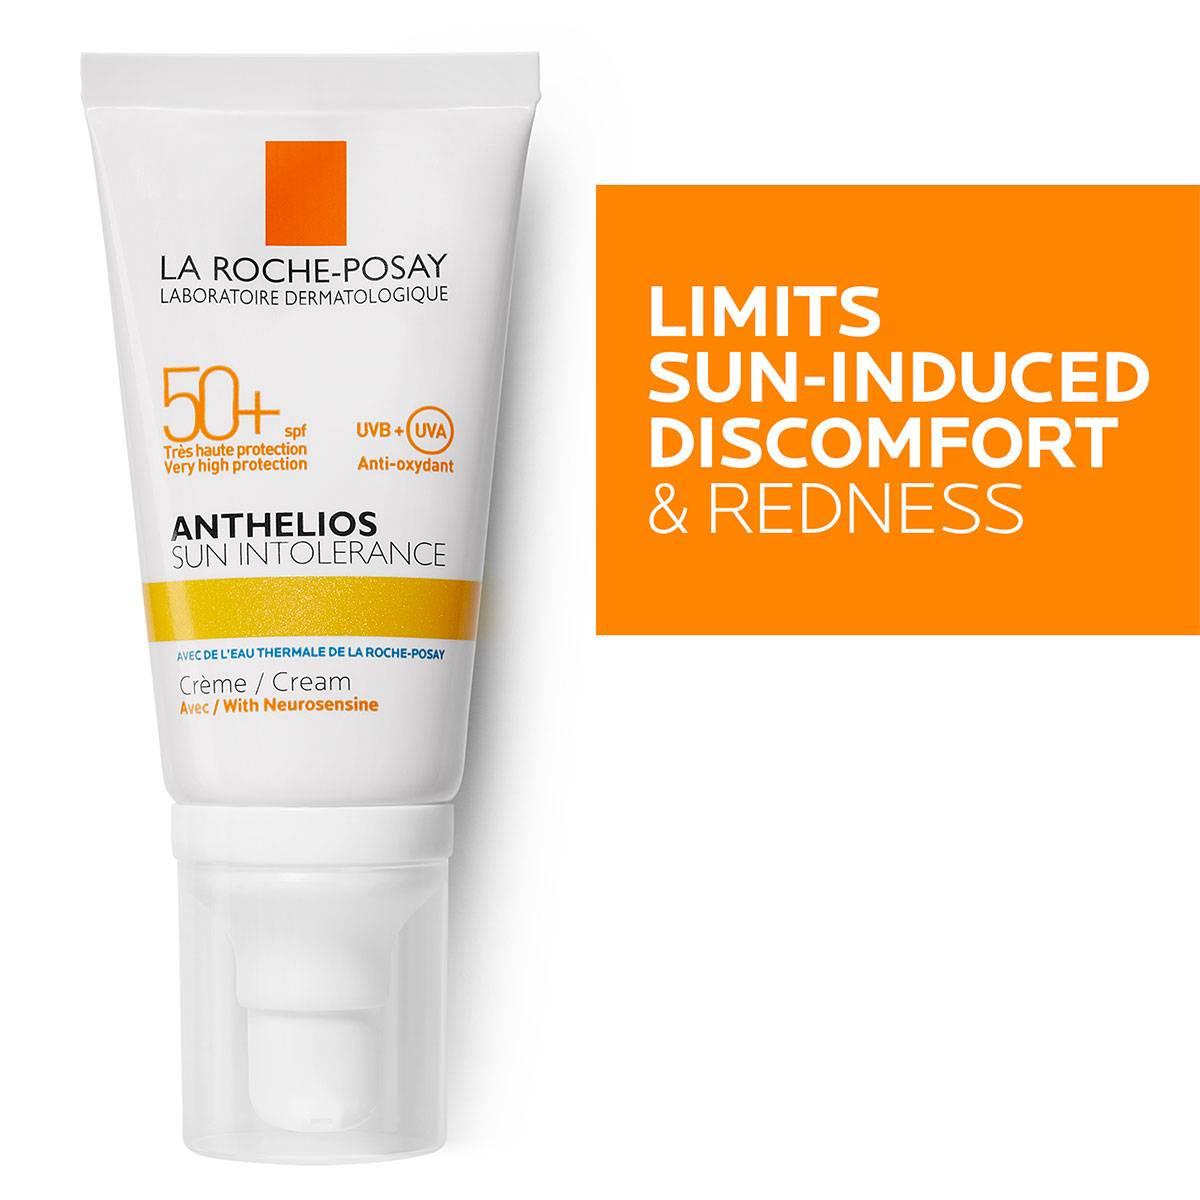 Słońce Anthelios Med Sun Intolerance Spf 50 50 ml | La Roche Posay